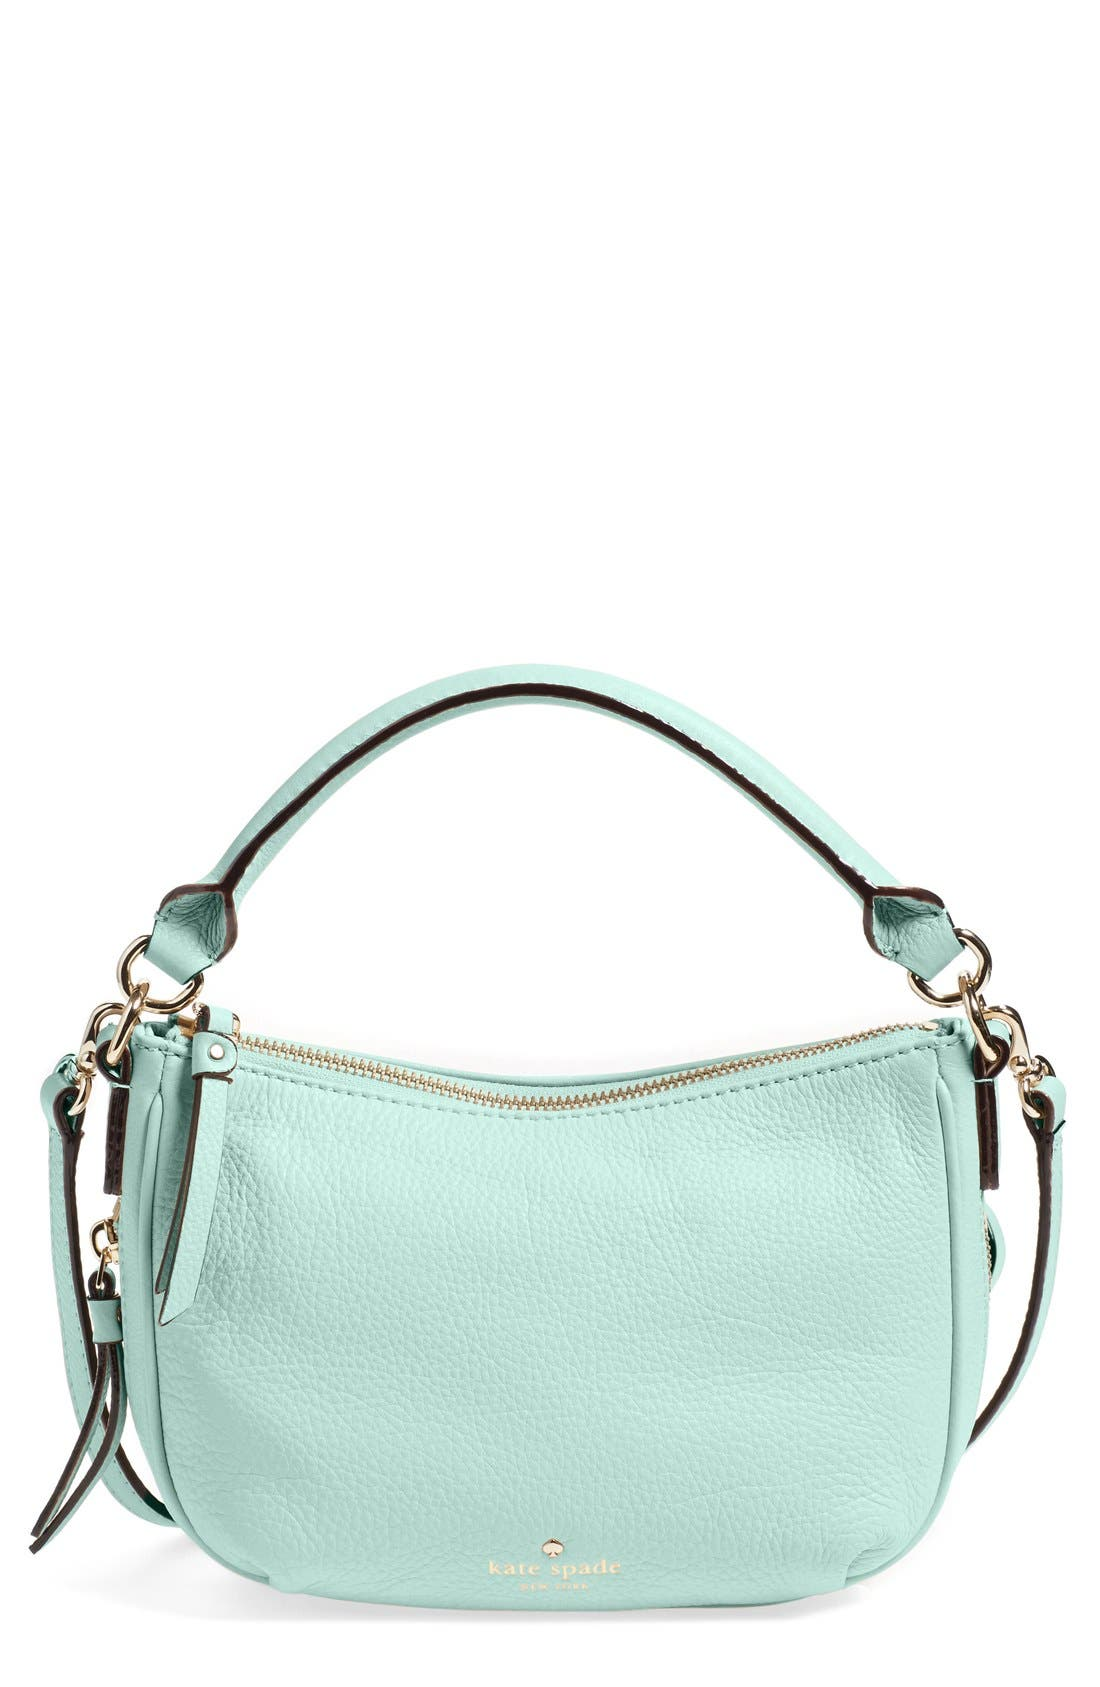 Main Image - kate spade new york 'cobble hill - mini ella' leather crossbody bag